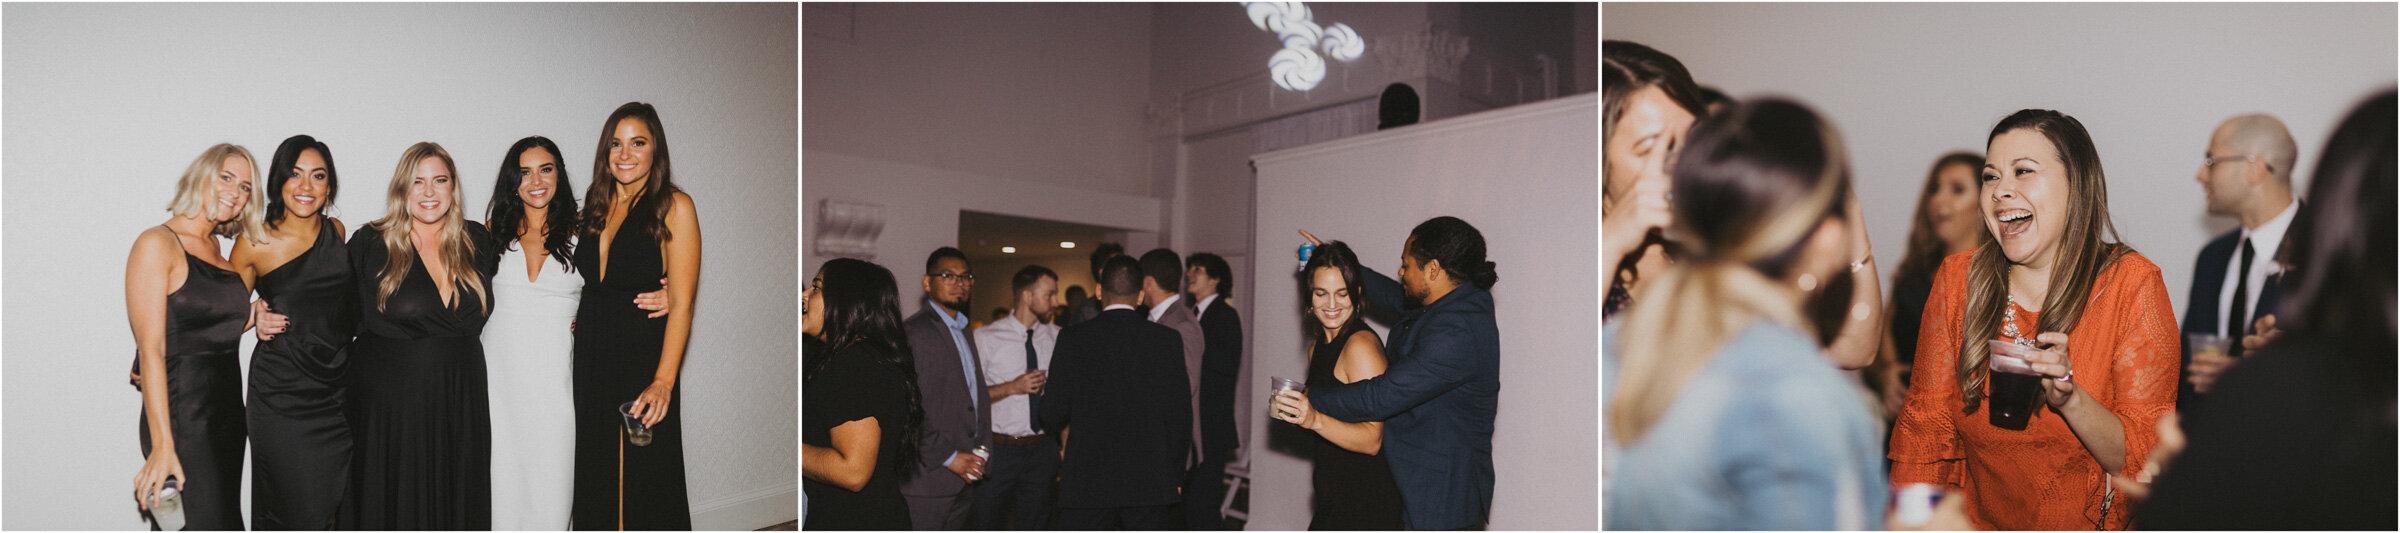 alyssa barletter photography la villa kansas city patio wedding sarah seven wedding dress-50.jpg